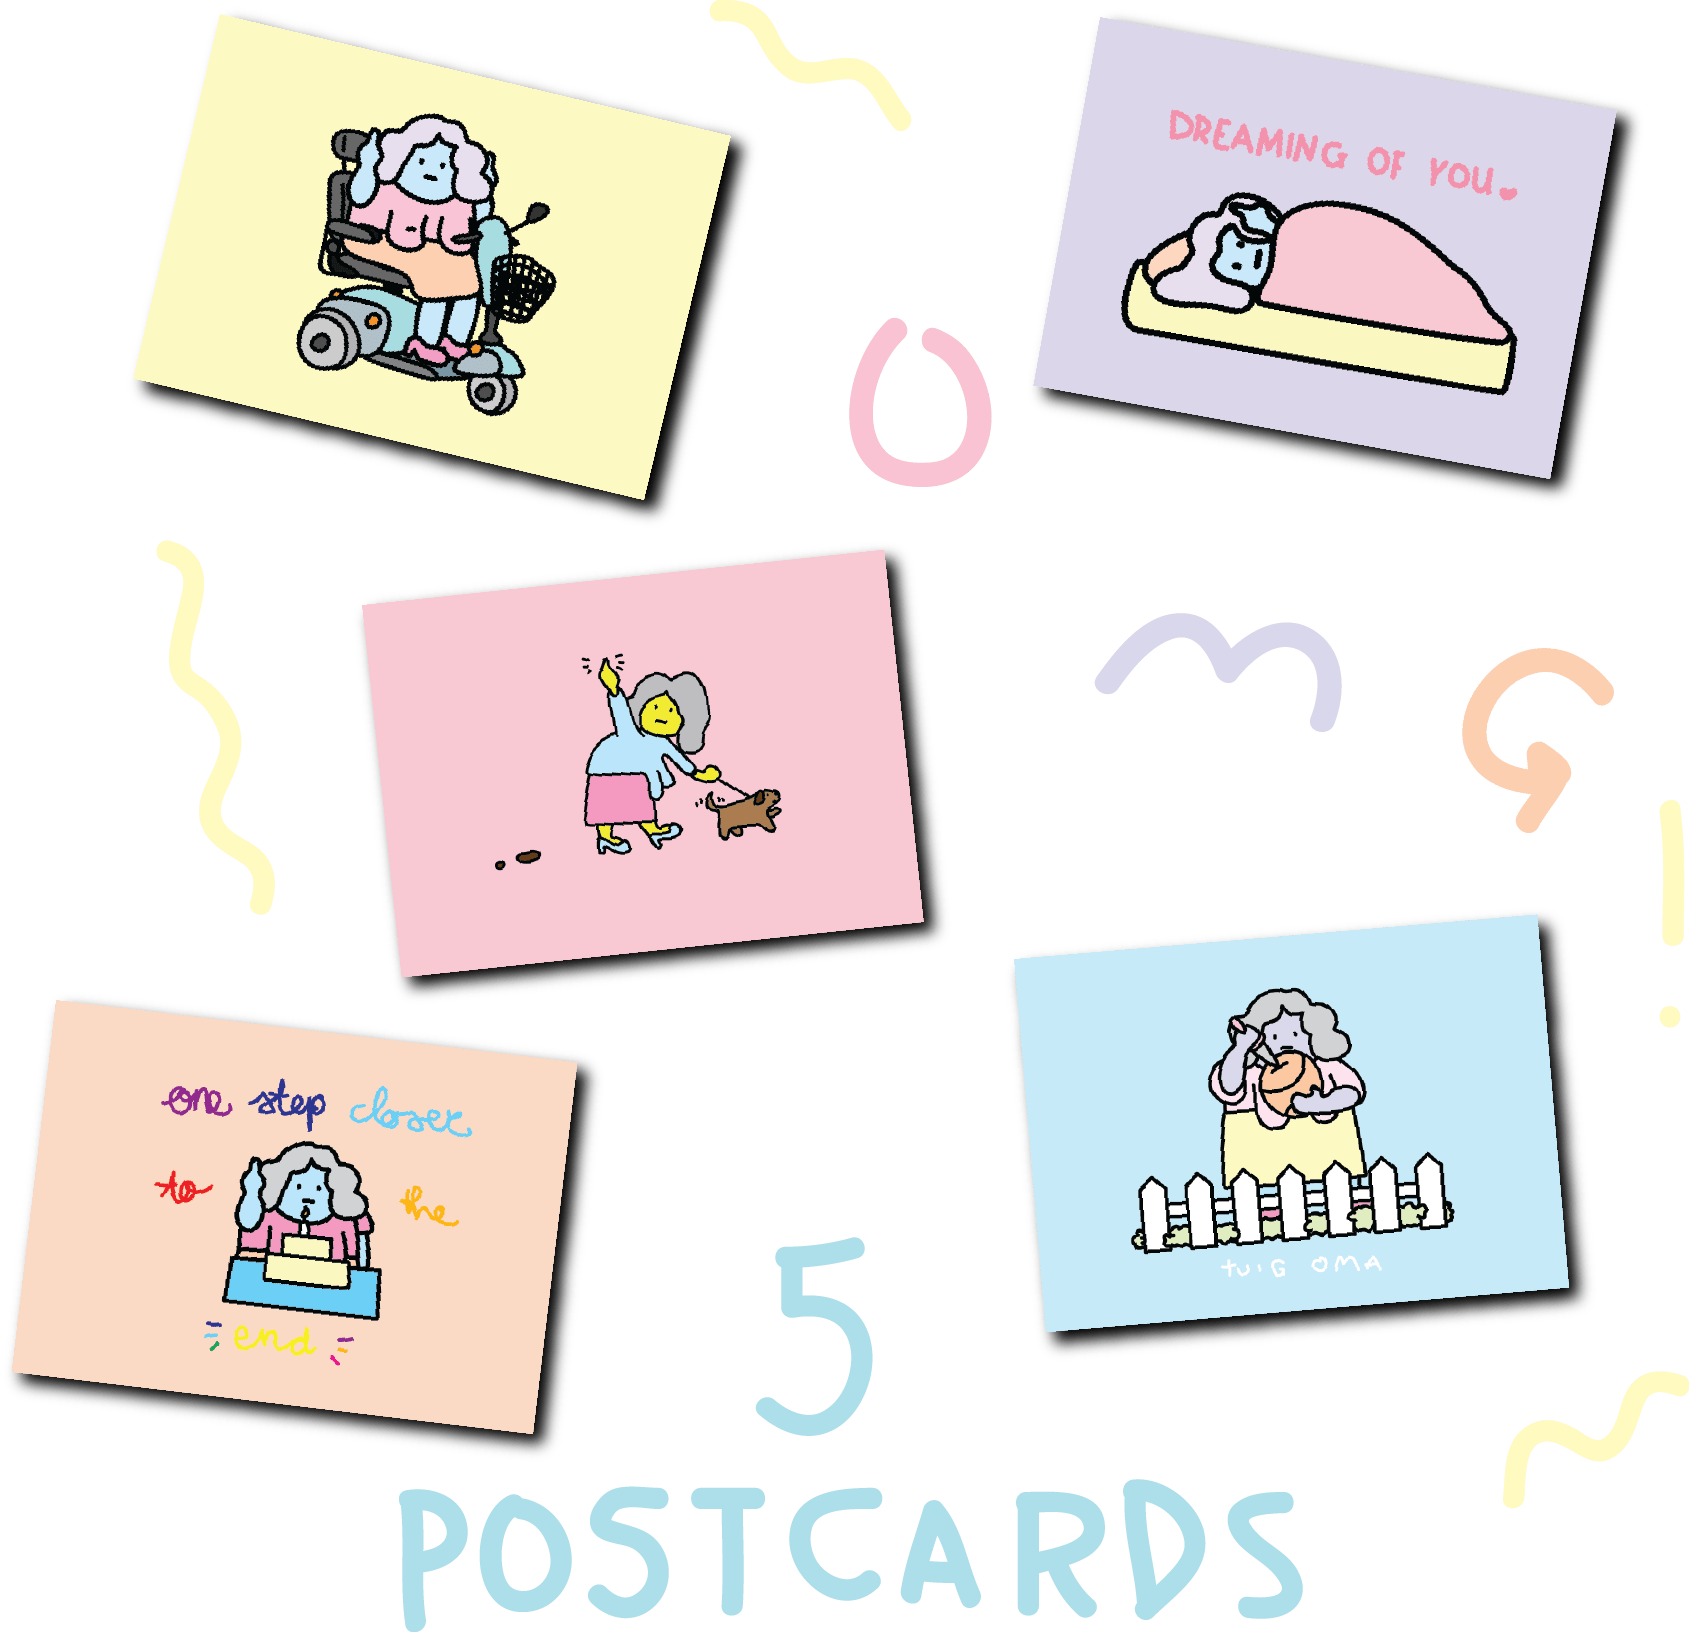 Postcard clipart post card. Postcards x tuig oma